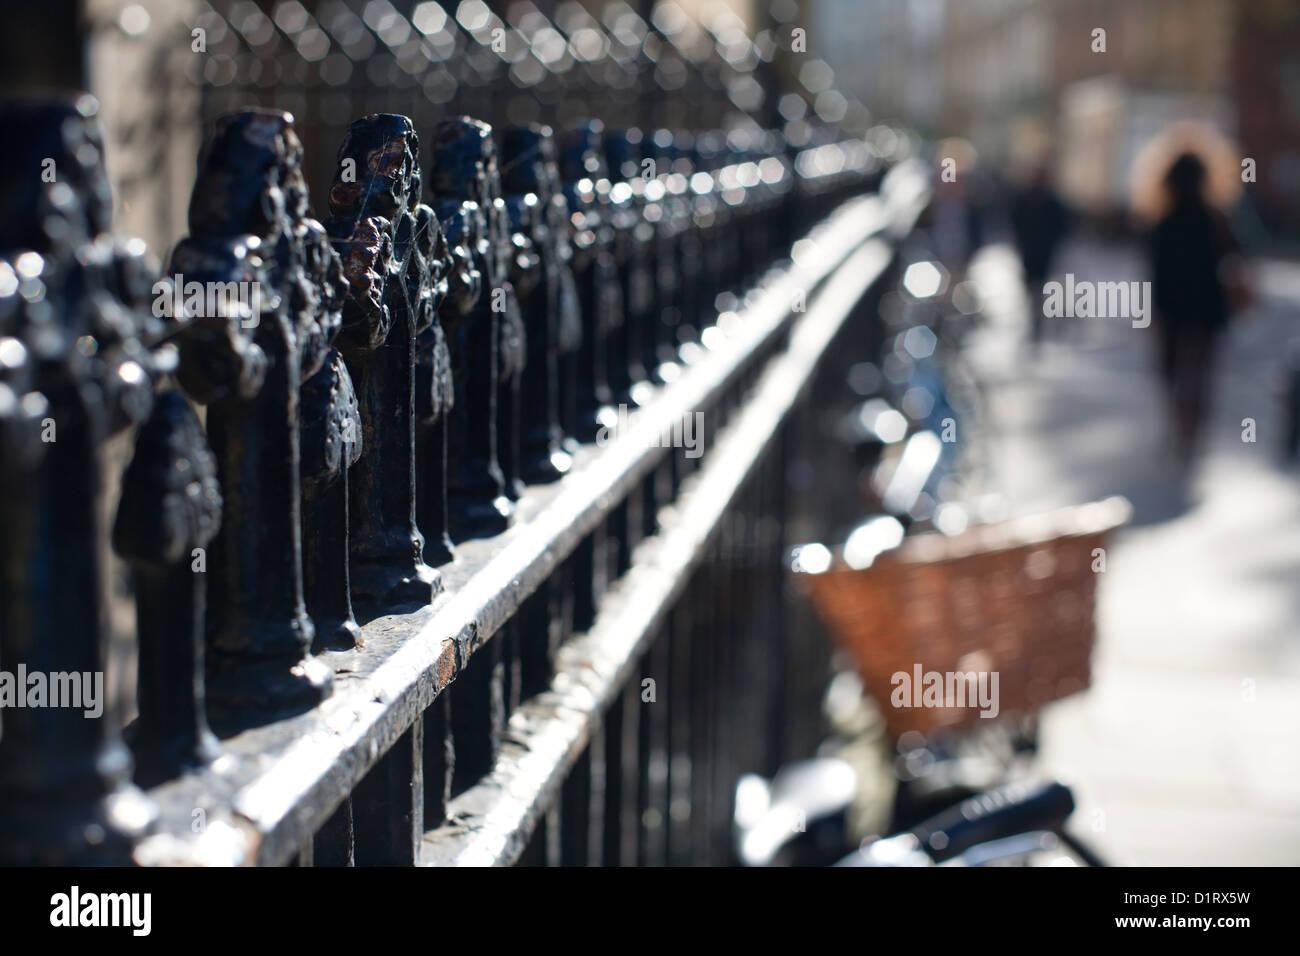 Cast Iron Railings on Trumpington Street Cambridge, England, UK - Stock Image